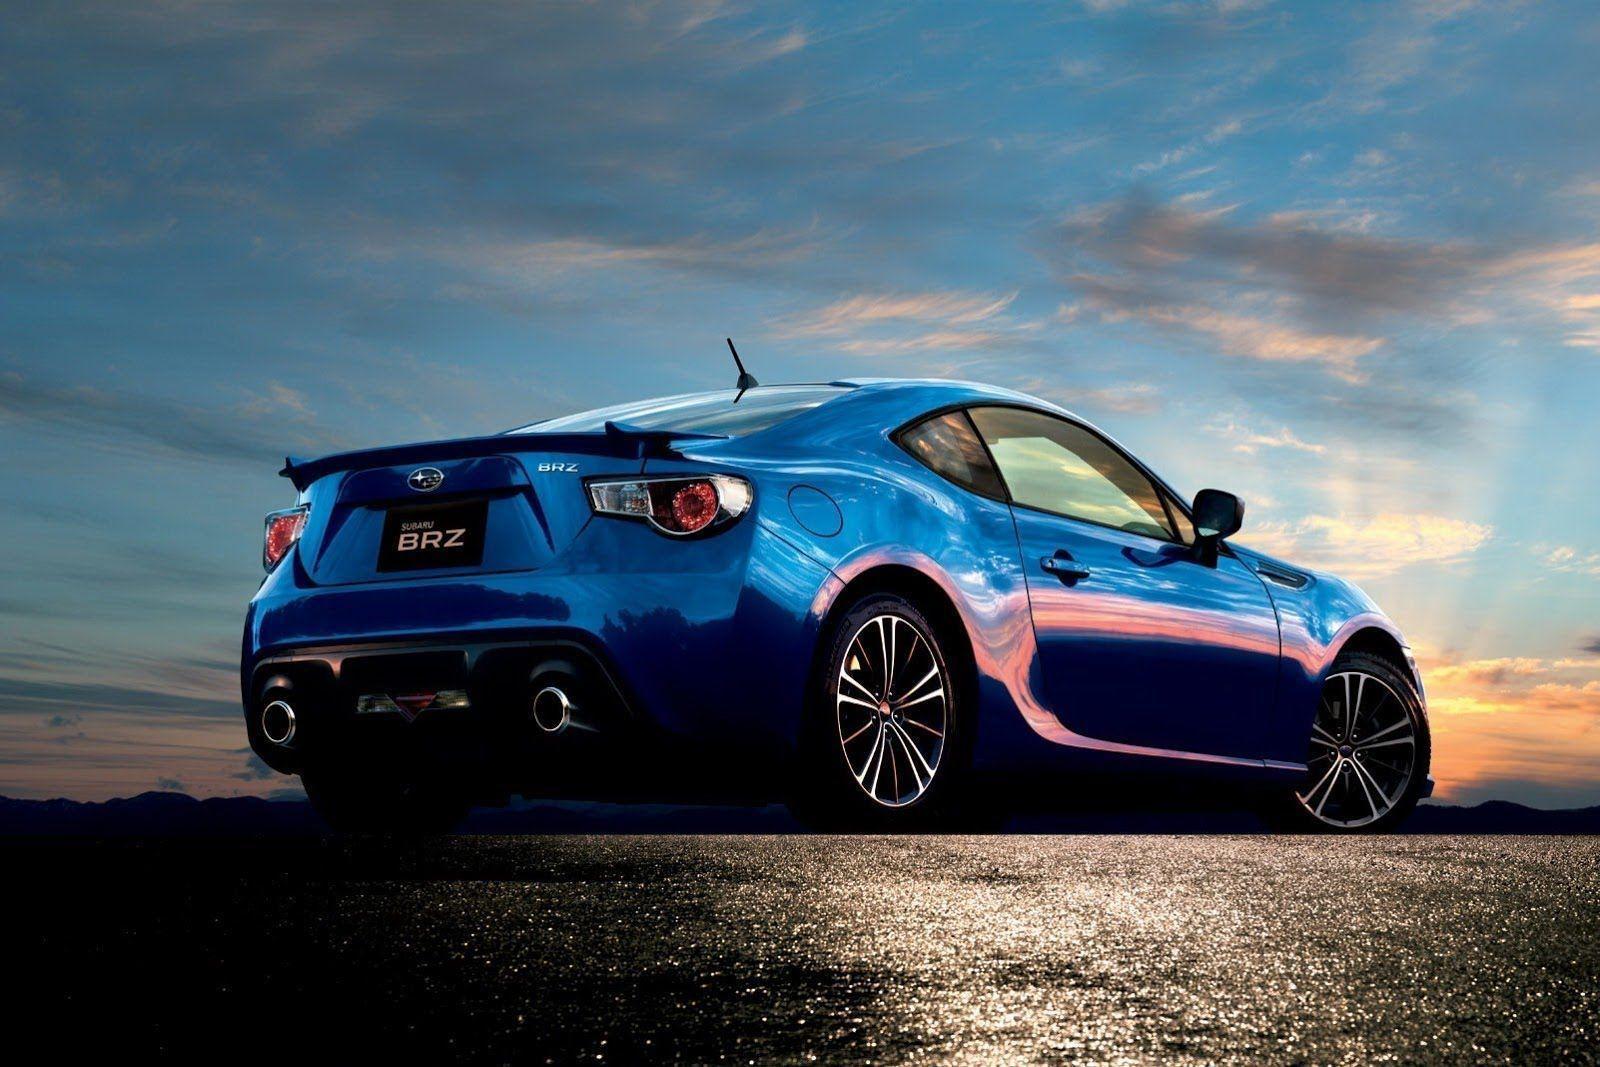 Subaru Brz Sti Wallpapers - Wallpaper Cave